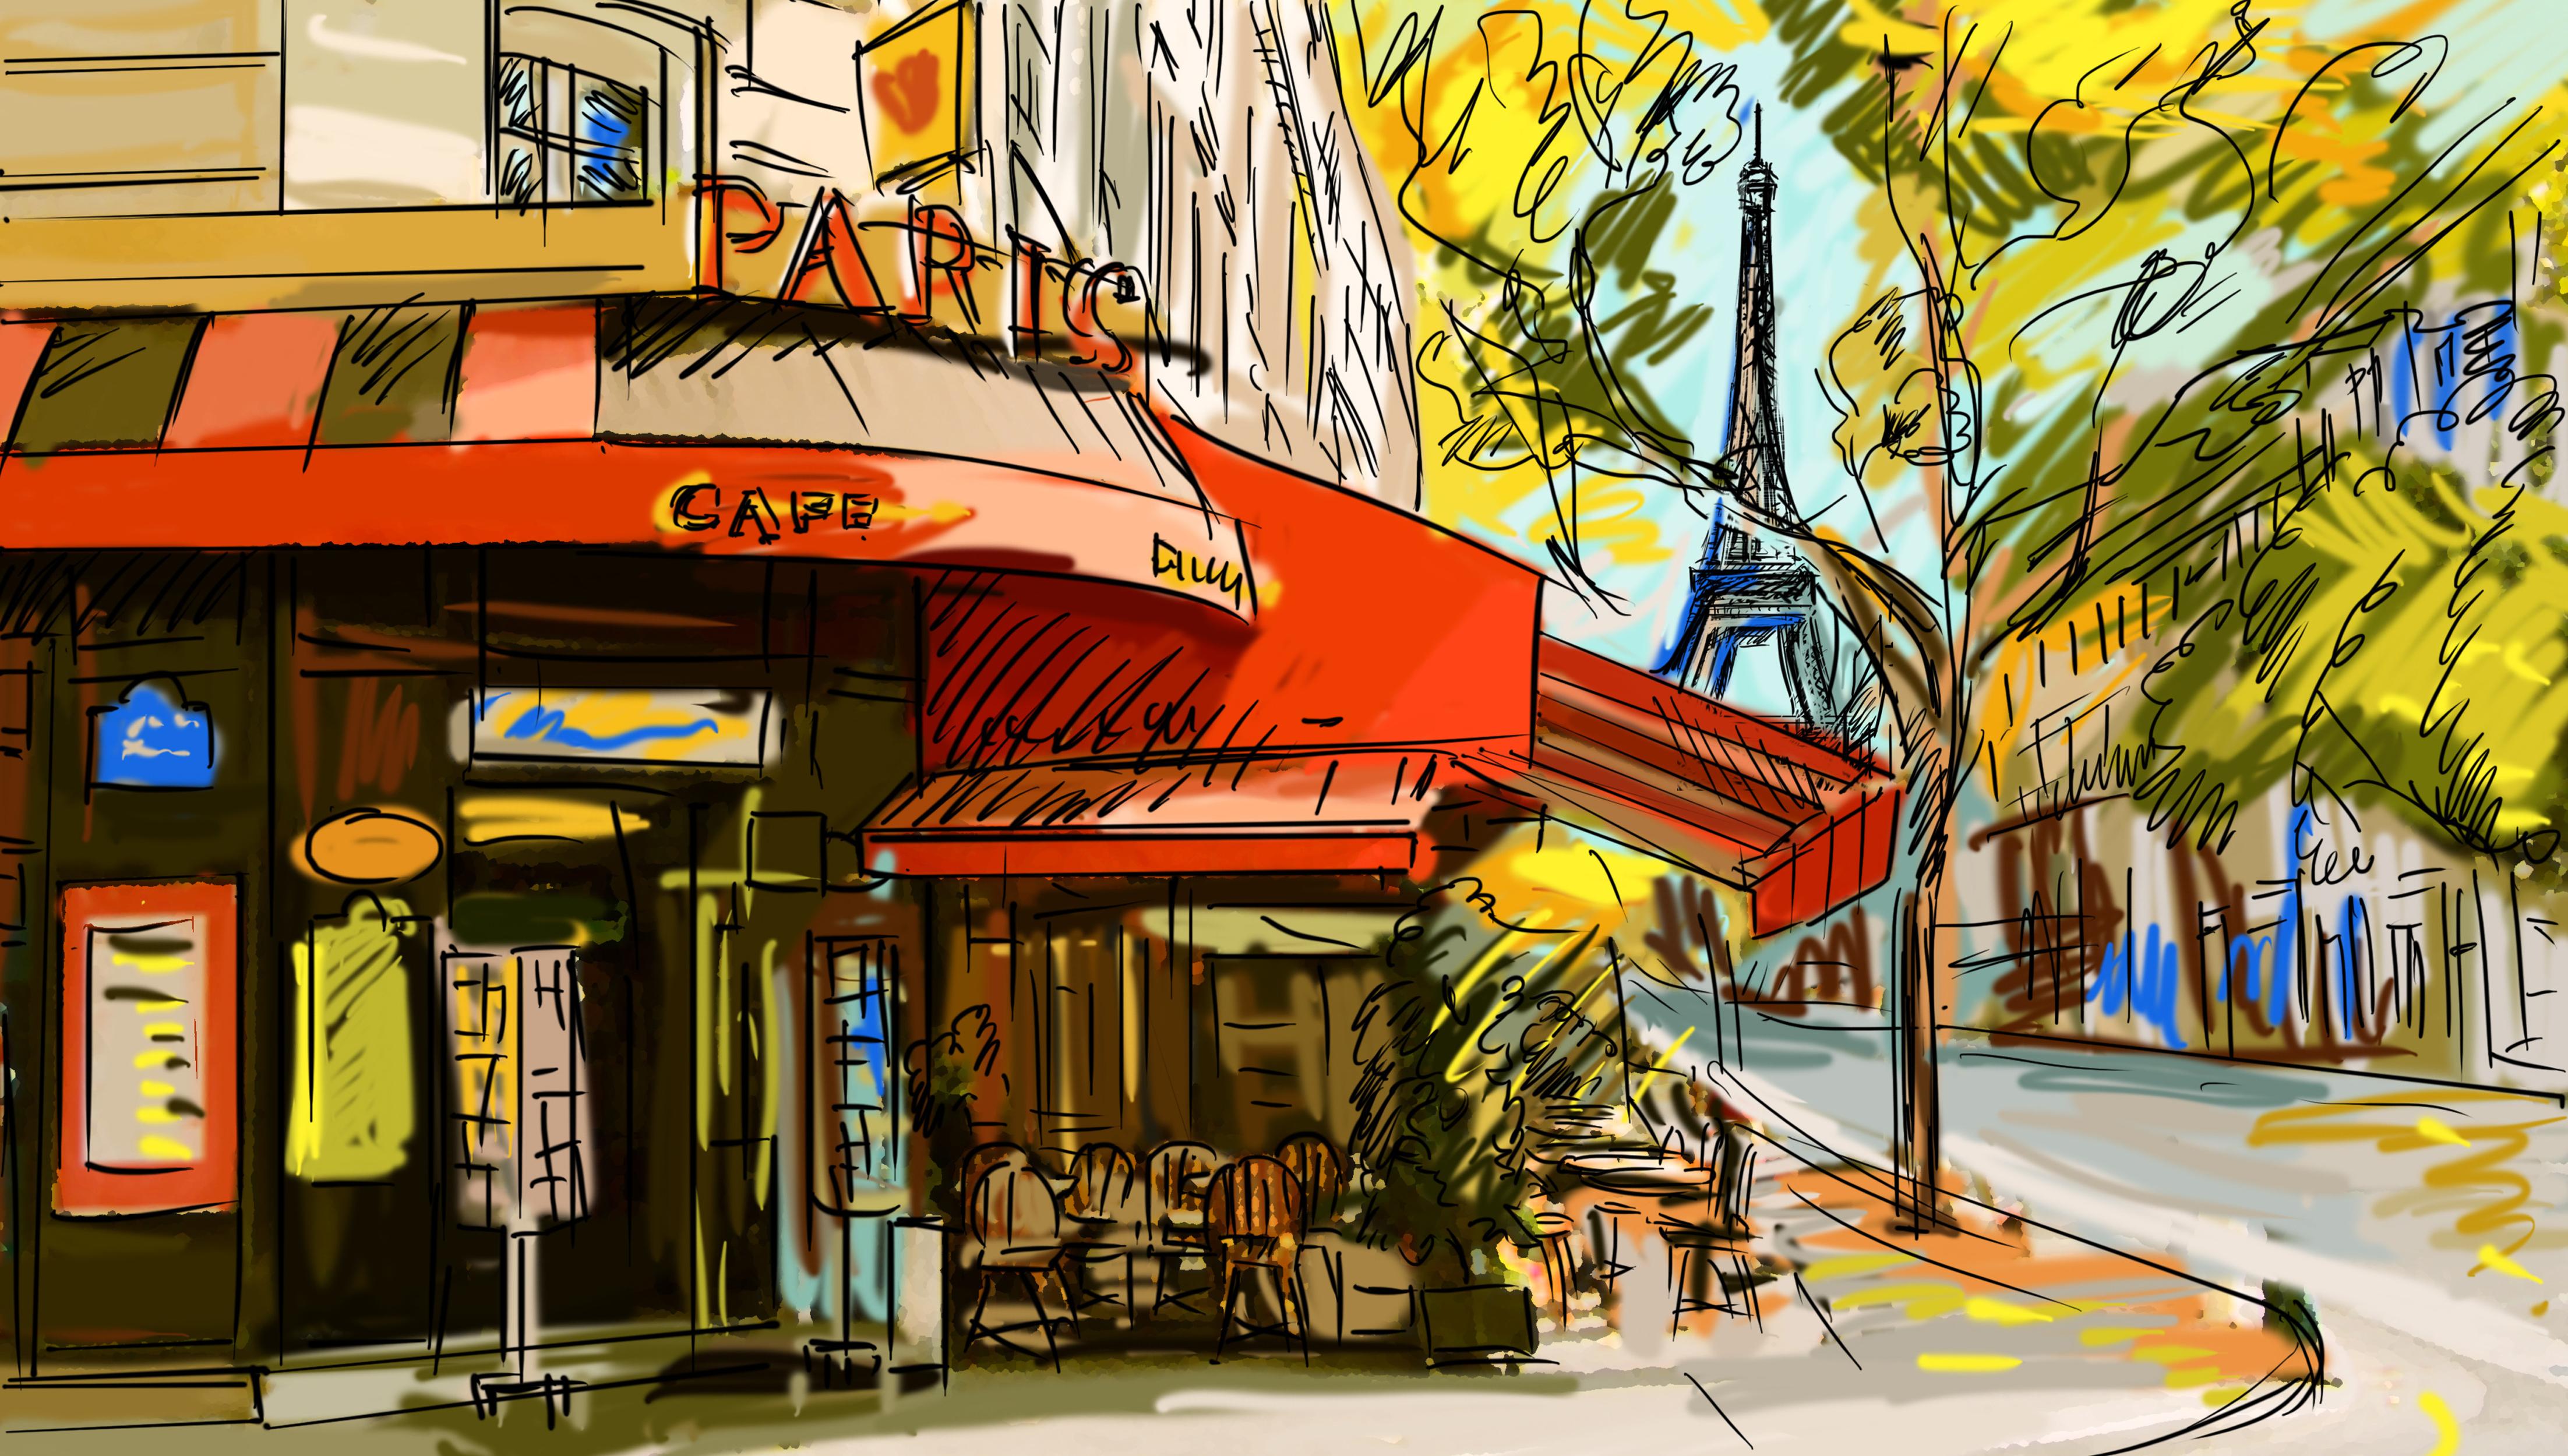 Woof Paris Street Cafe Wallpaper   mario brosscom 4408x2500